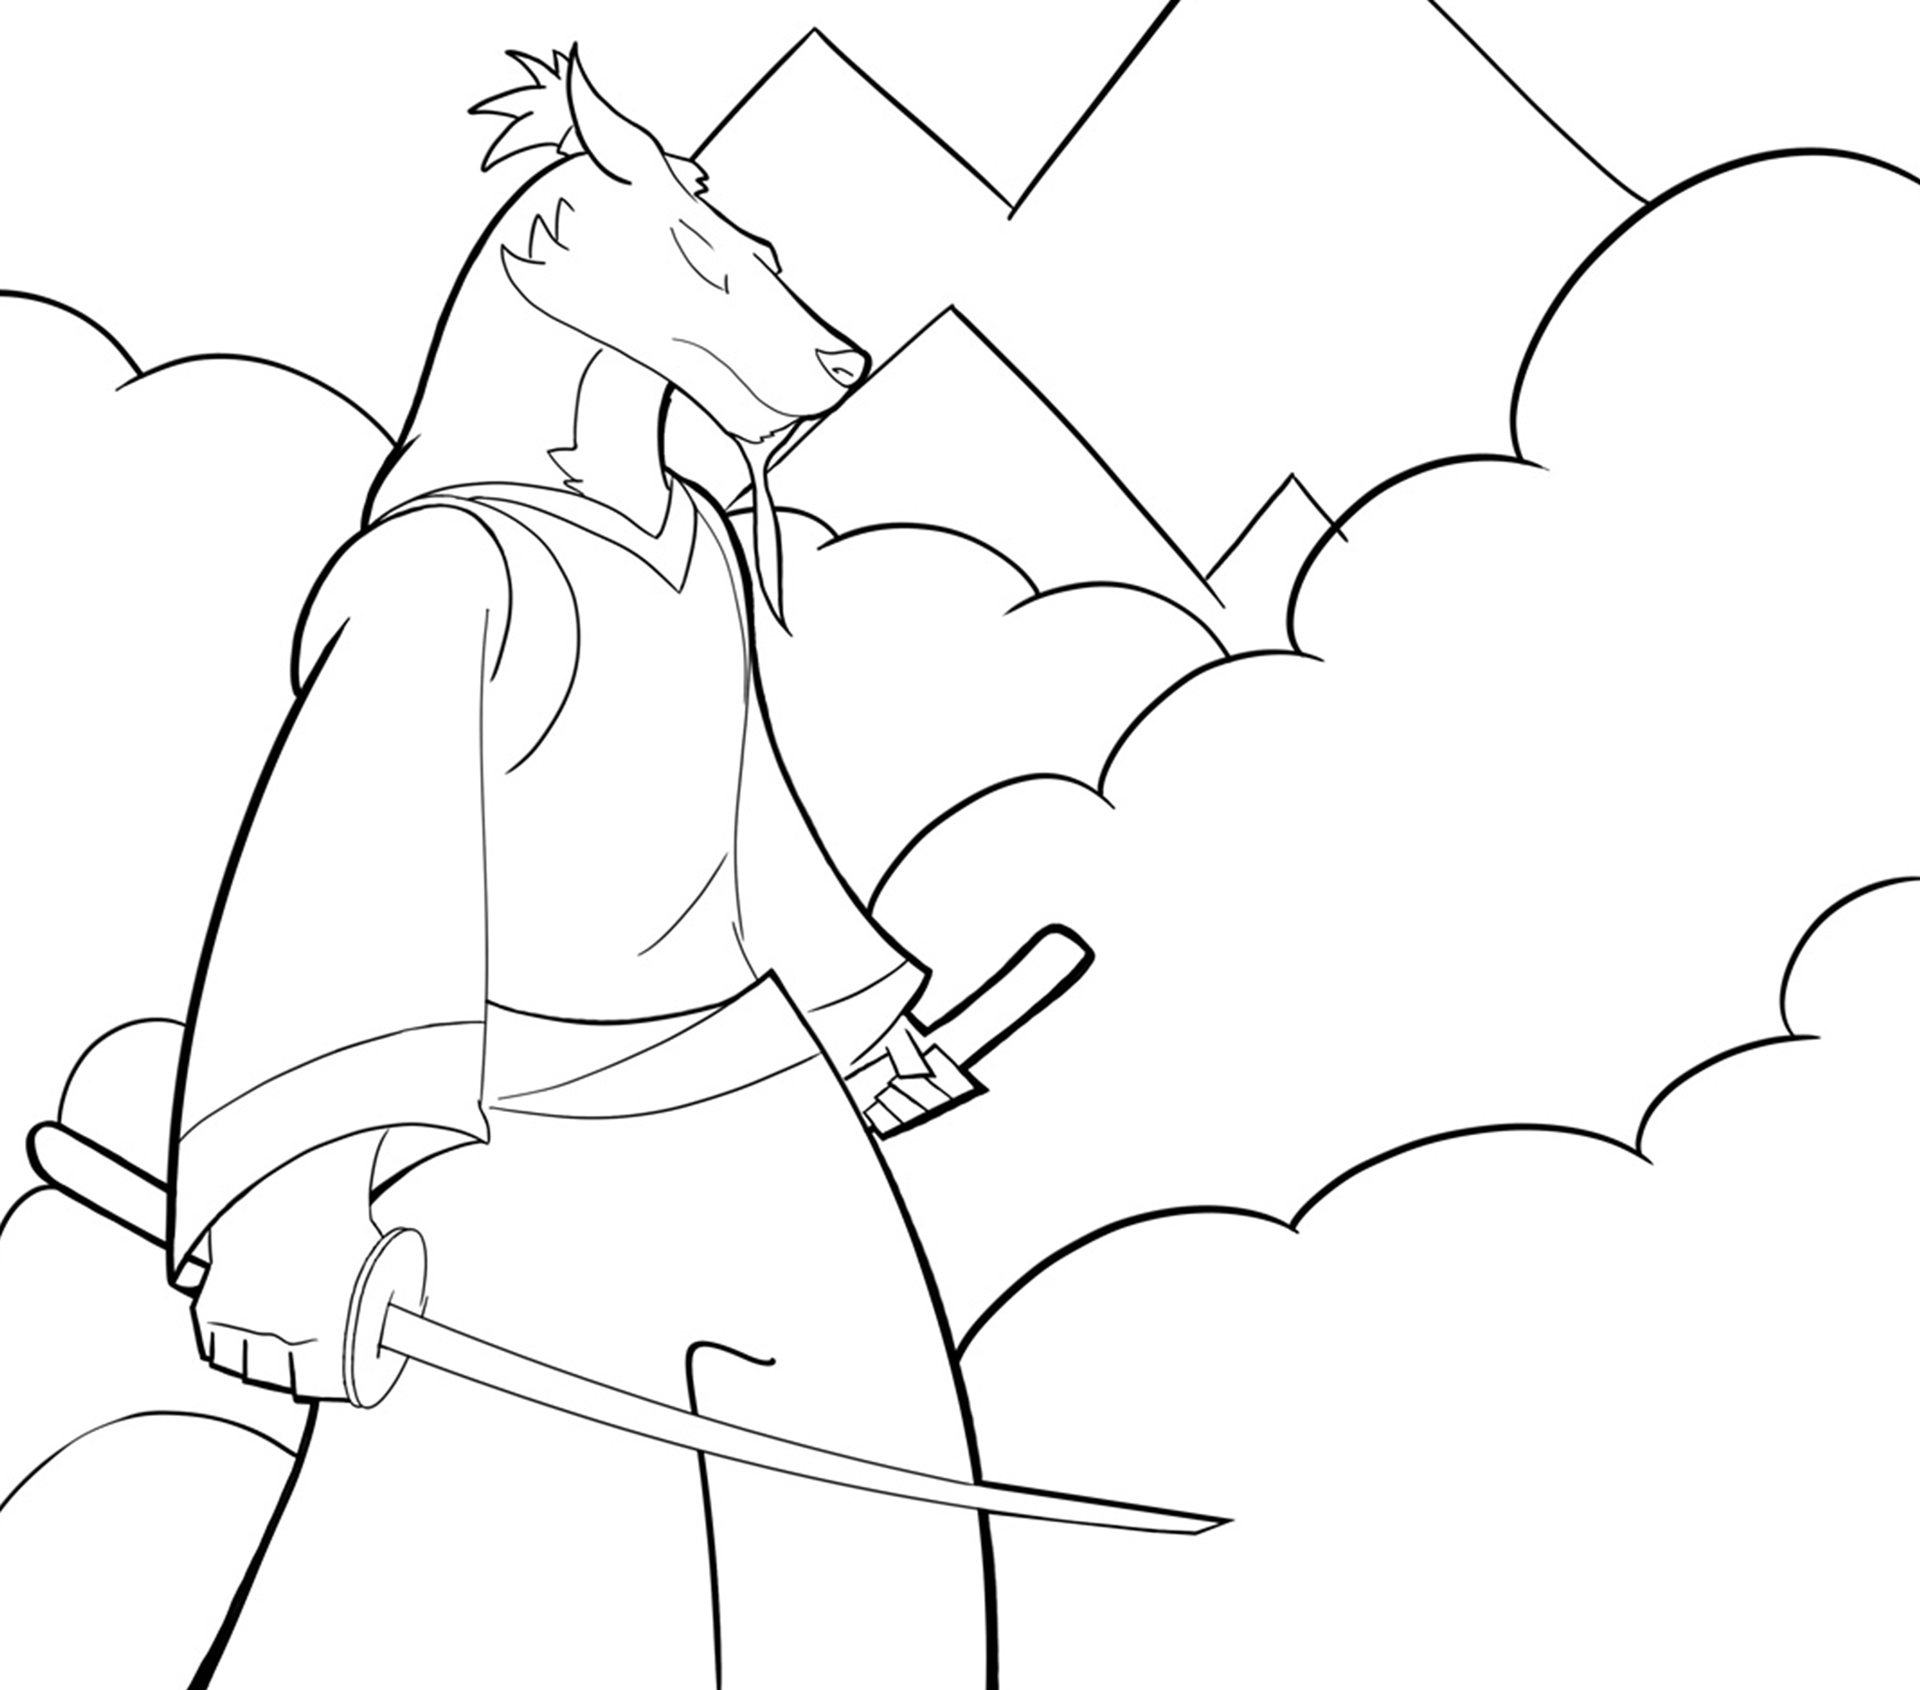 samurai-wolf-illustration-05.jpg